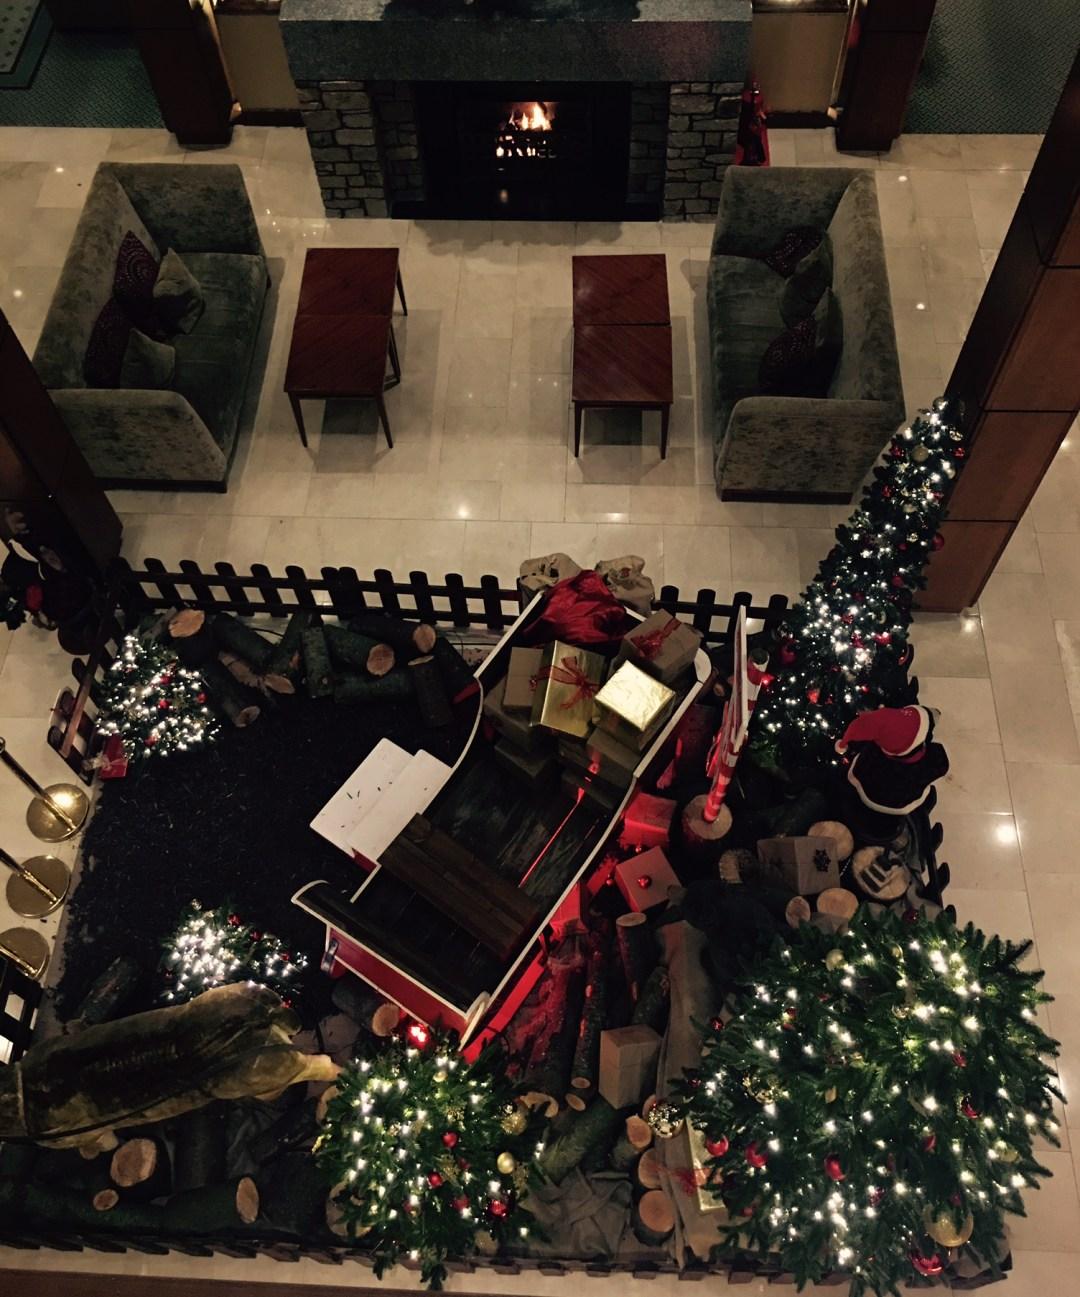 druids-glen-christmas-grotto-elainesrovesntroves